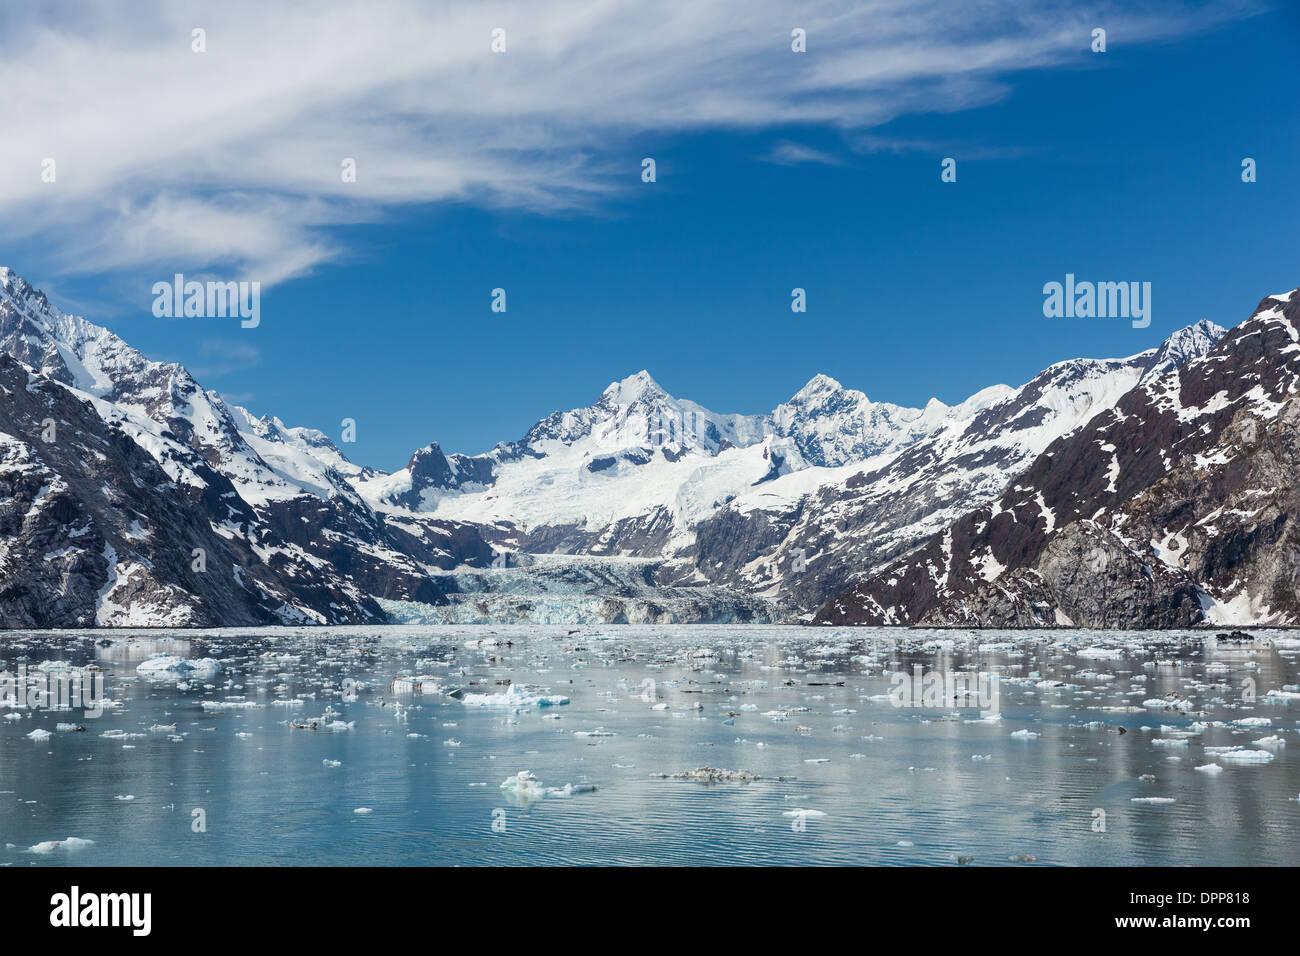 D'entrée de l'Université Johns Hopkins, Glacier Bay, Alaska. Banque D'Images